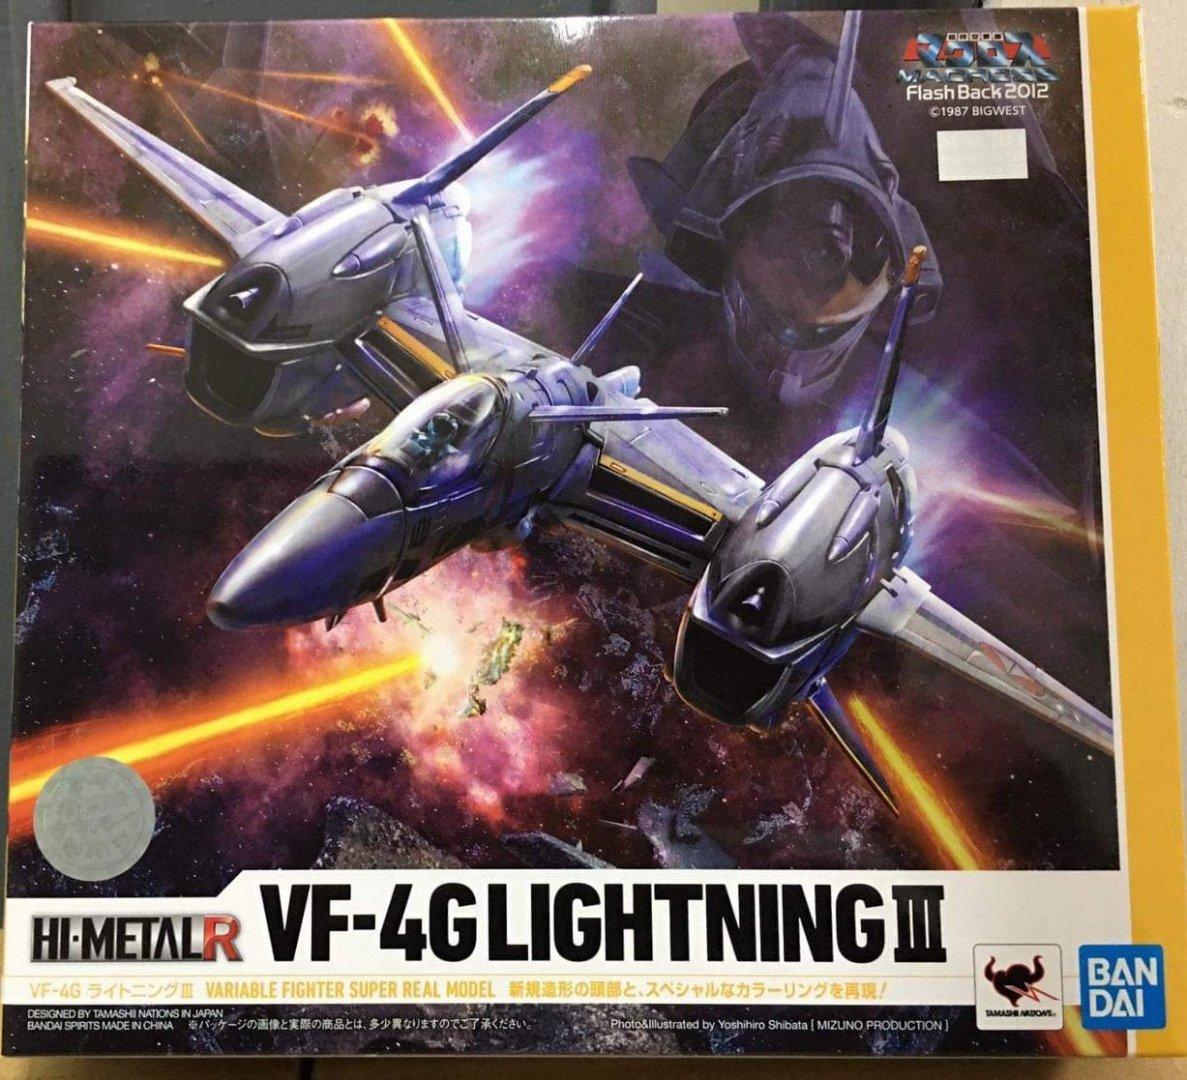 81B6EB8C-F39F-4FAD-89DE-D409CB2B9233.thumb.jpeg.fa7aa32f499334368ce7c27532e2350a.jpeg